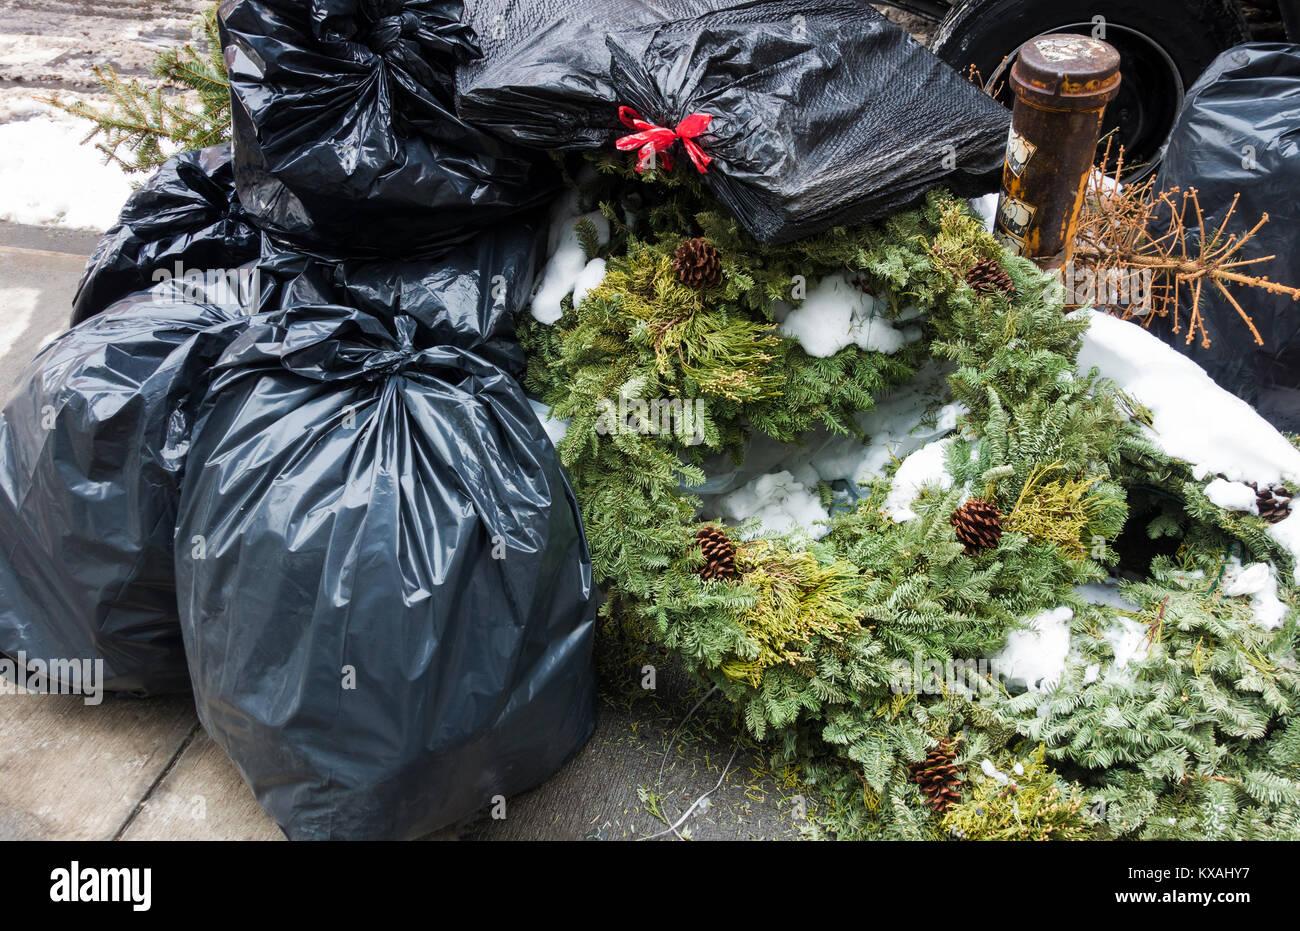 Pile Rubbish In New York Usa Stock Photos & Pile Rubbish